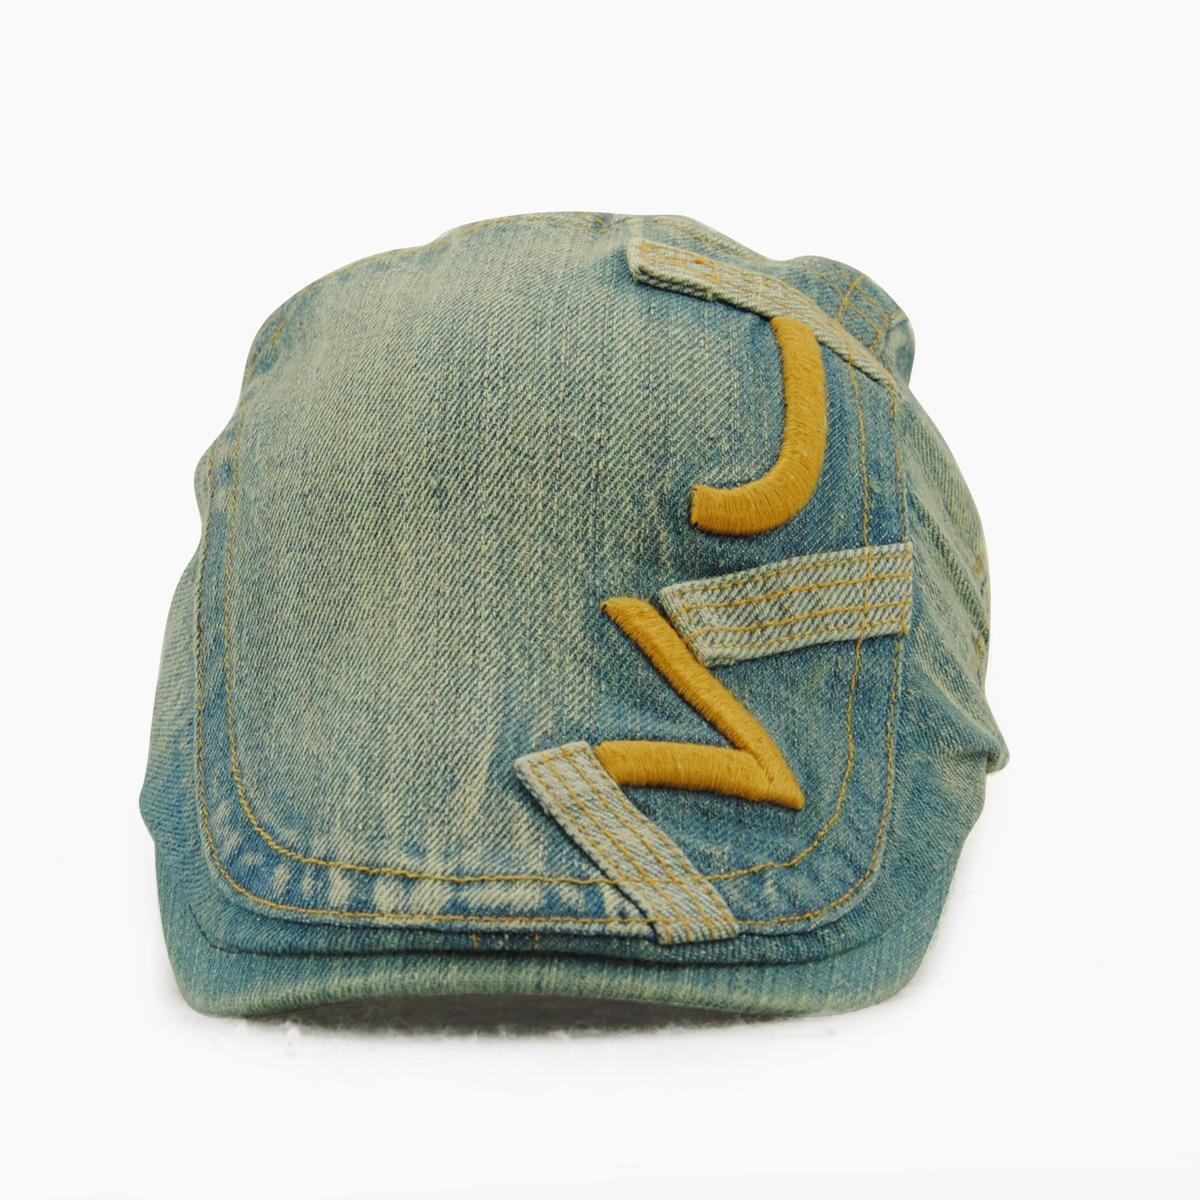 3fd7423415e60 Male Pure Cotton Peaked Cap Men Sun Hat Adult Outdoors Newsboy ...